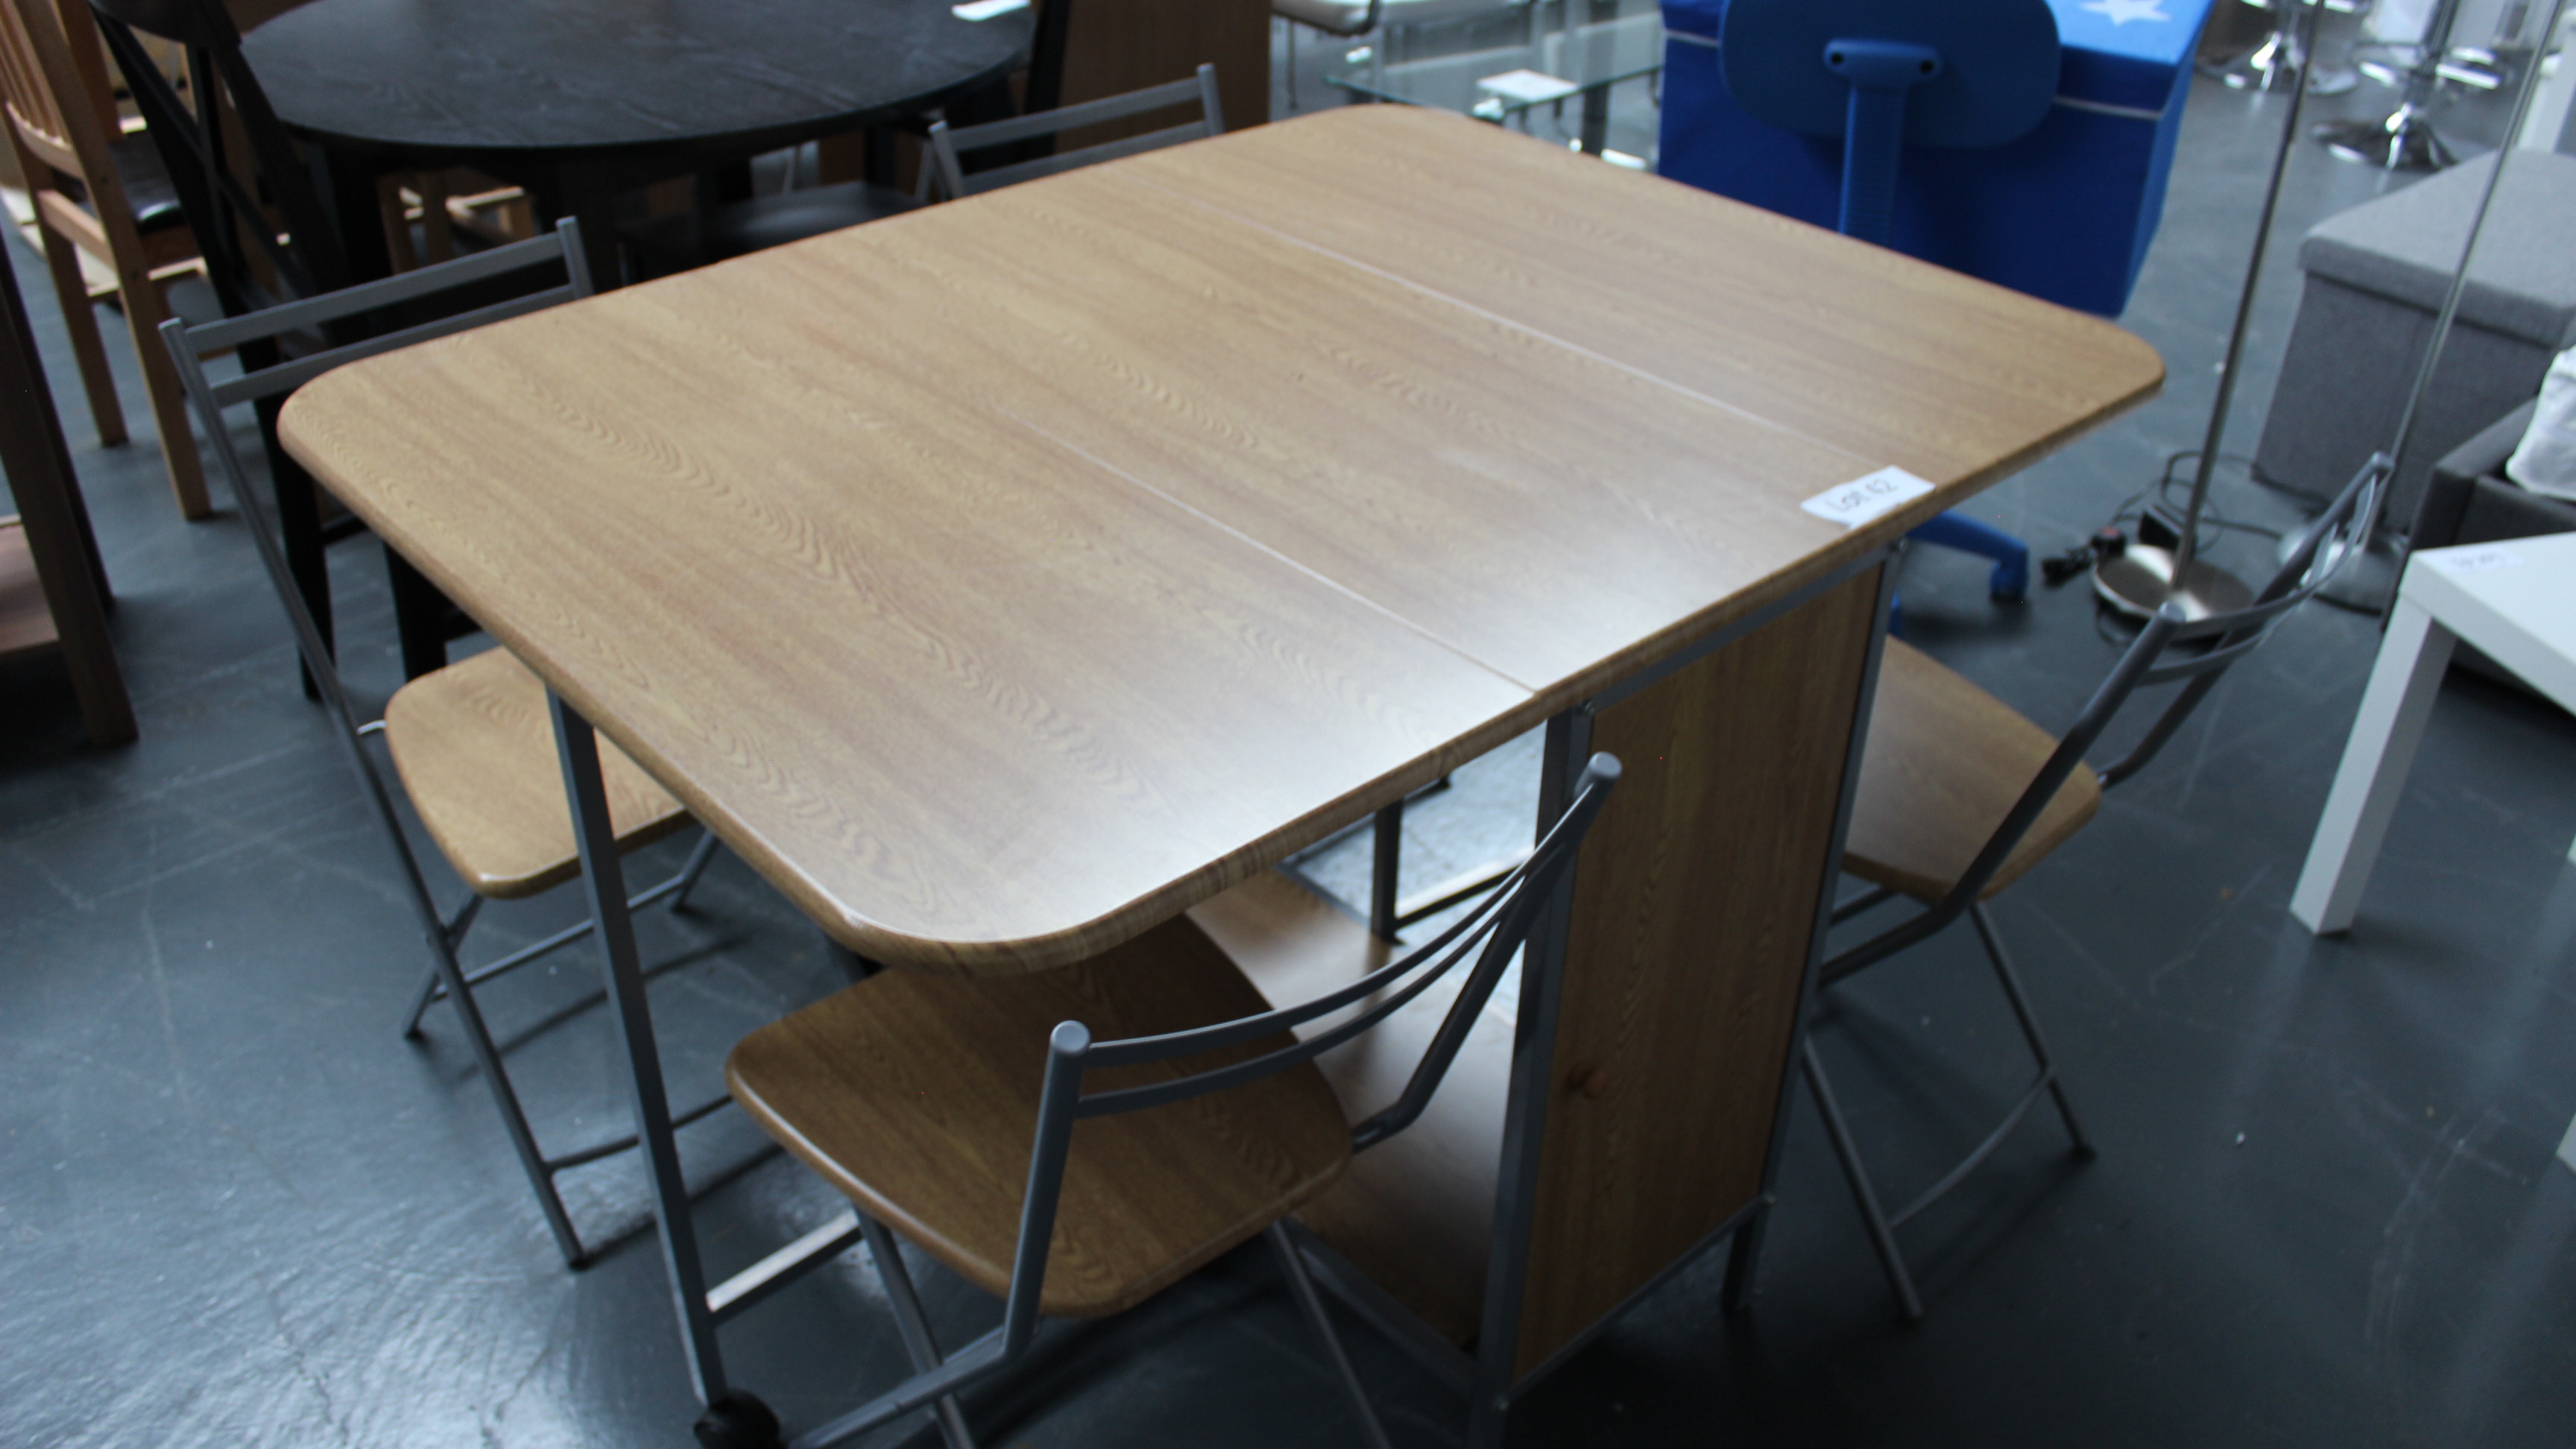 Lot 42 - Folding Storage Table & 4 Chairs. Customer Returns